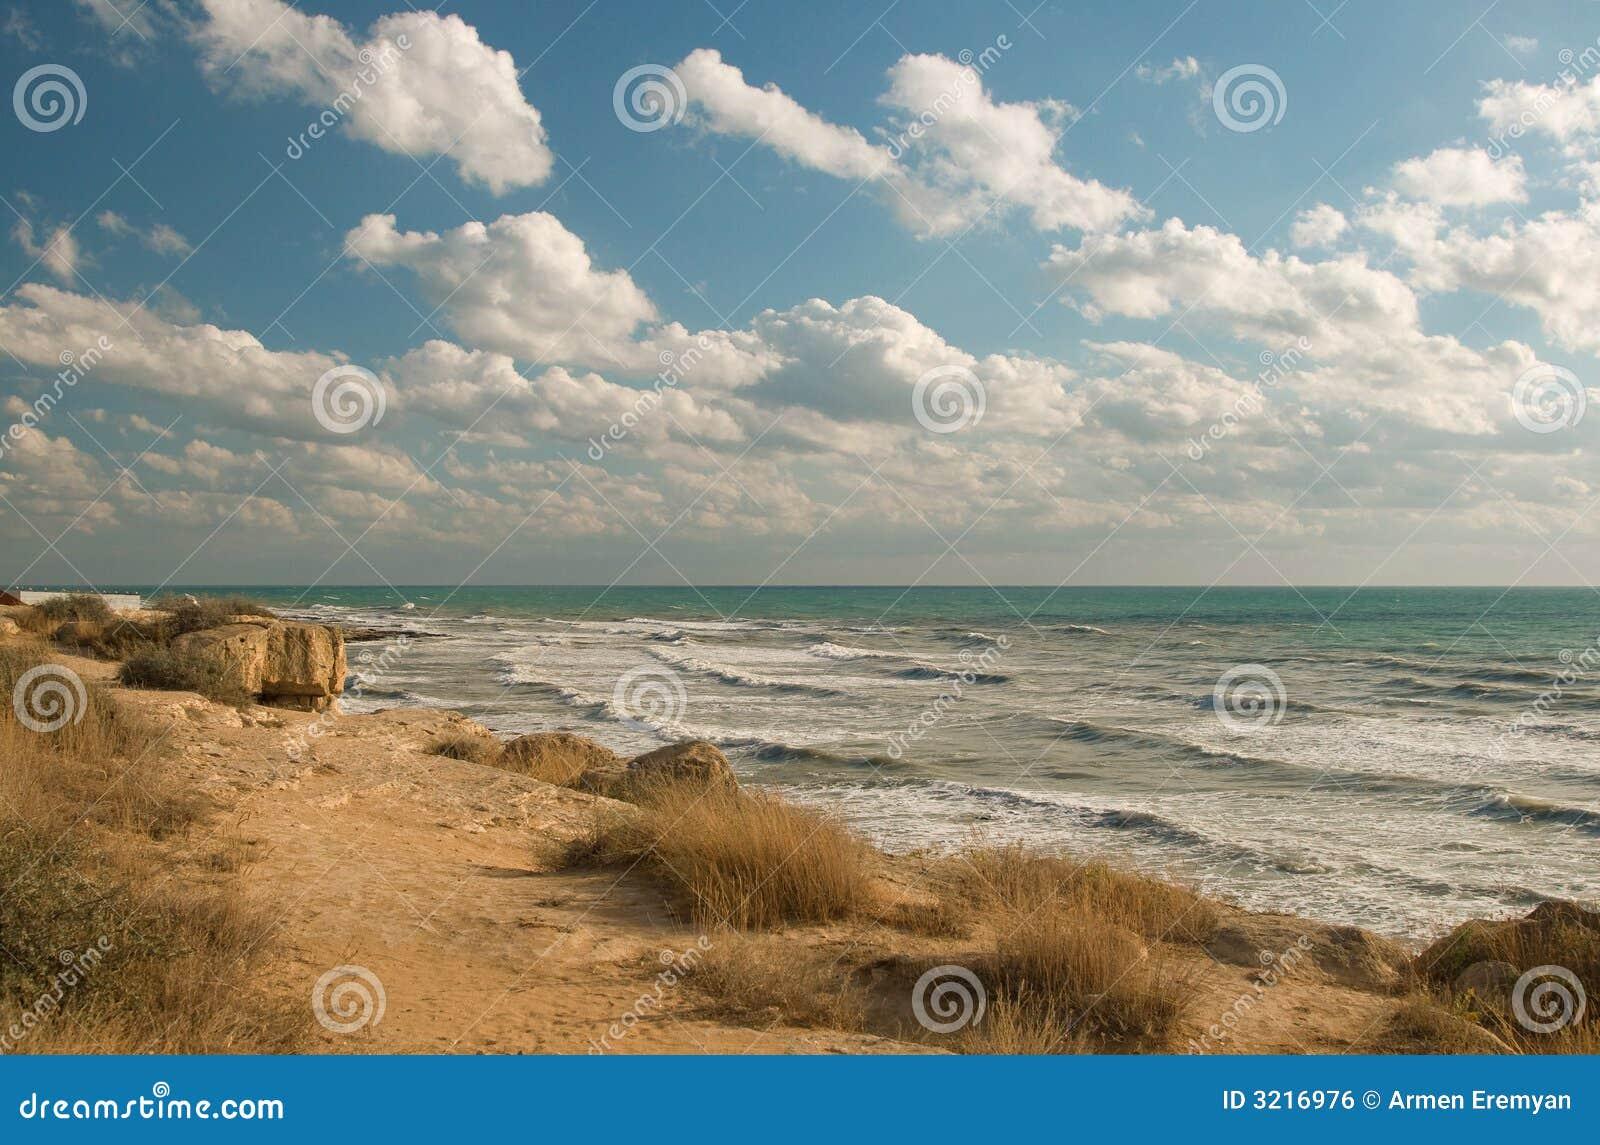 поплавайте вдоль побережья море